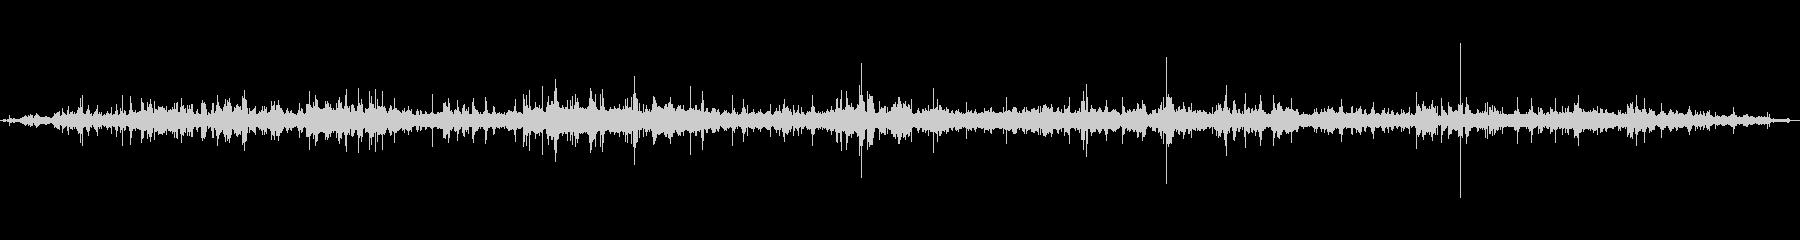 [ASMR]波打ち際の音_007の未再生の波形